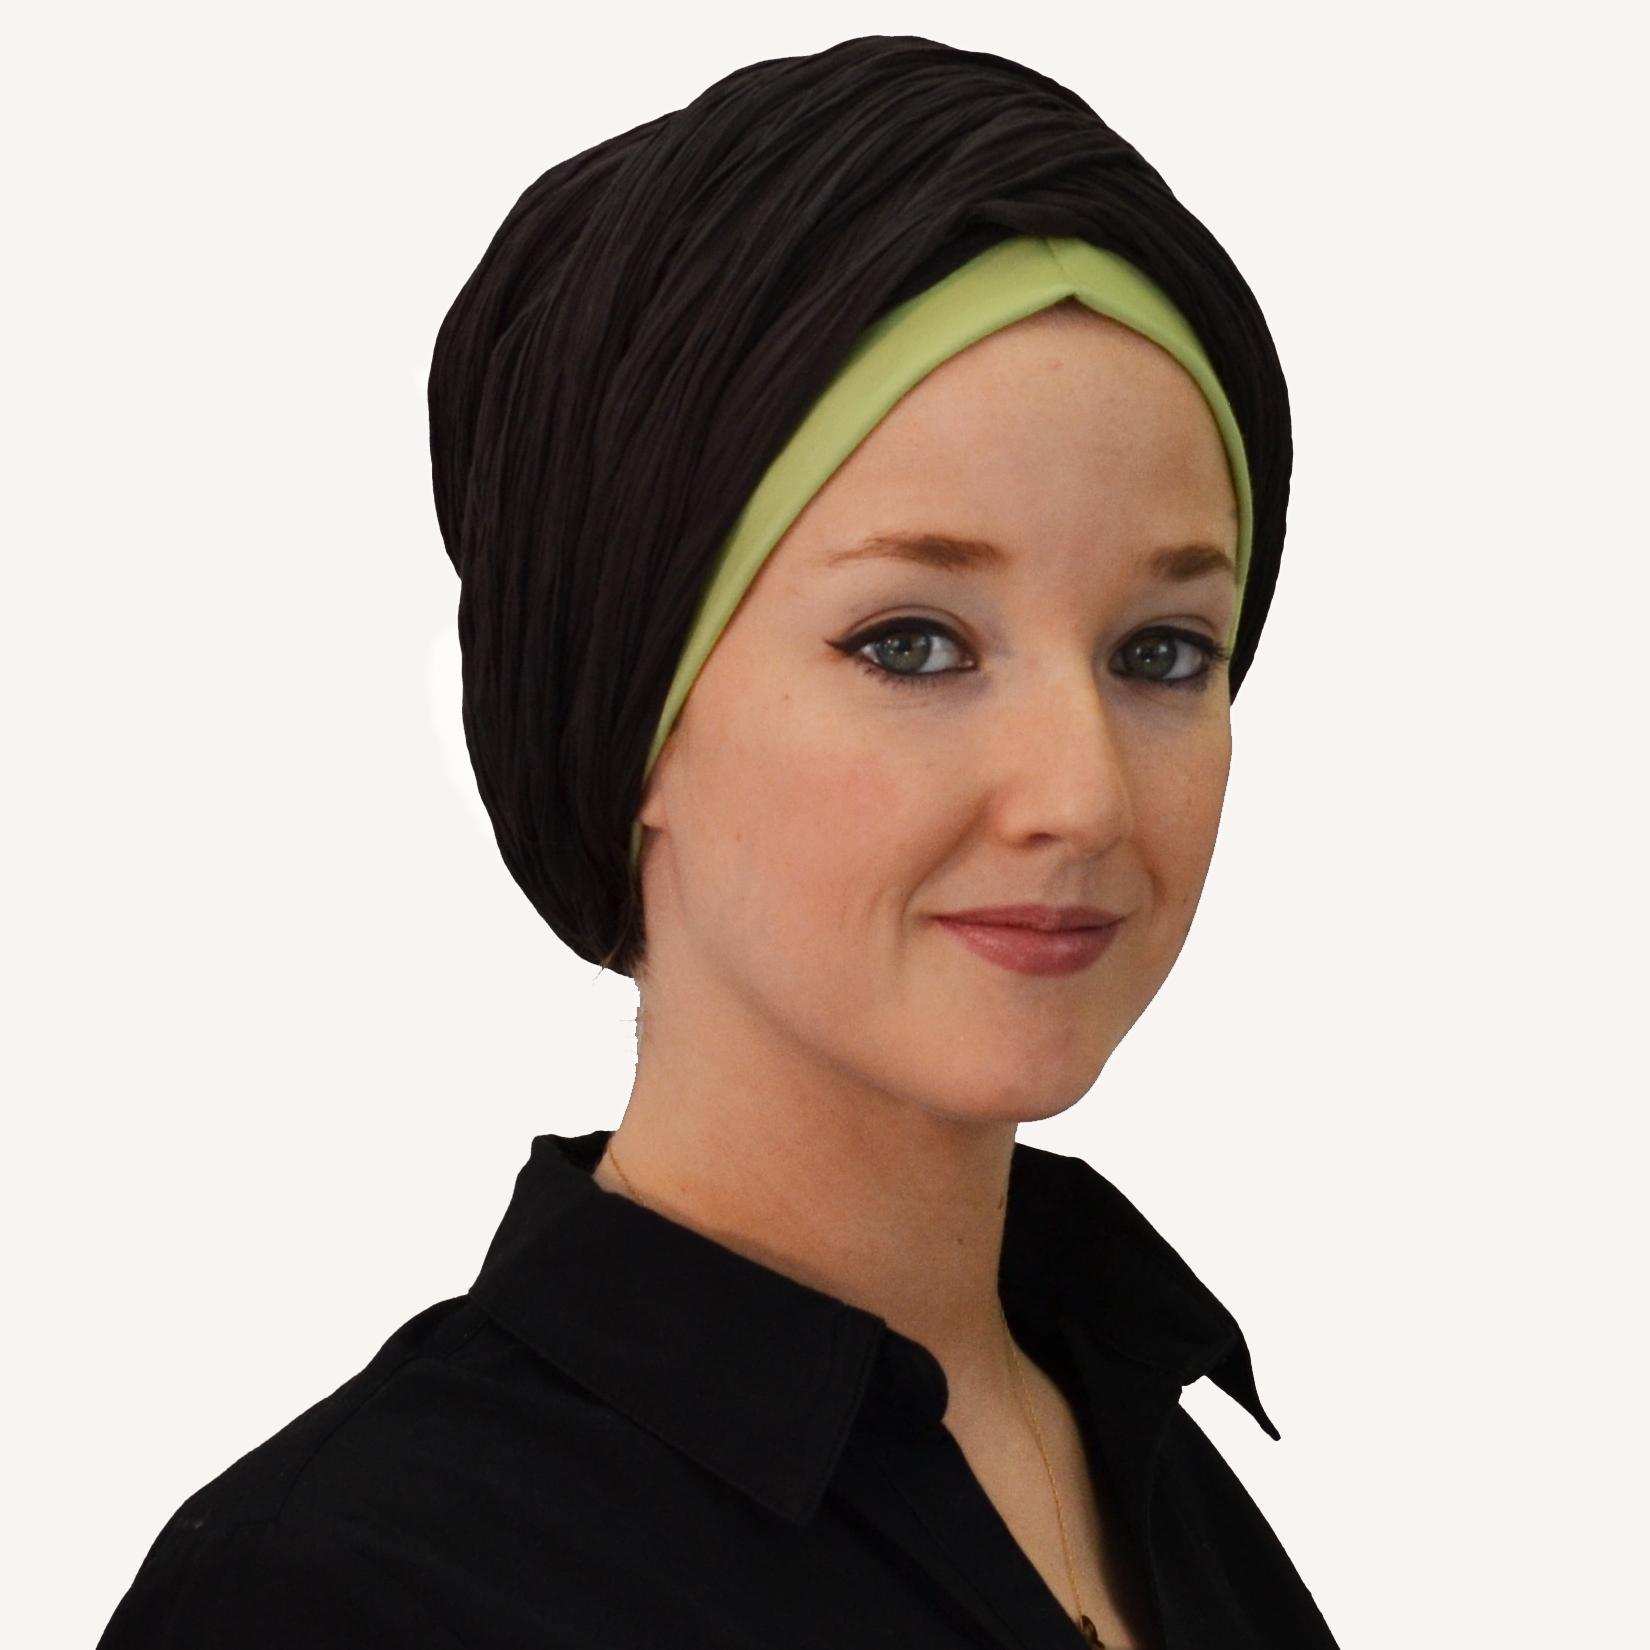 foulard femme pour la tete. Black Bedroom Furniture Sets. Home Design Ideas